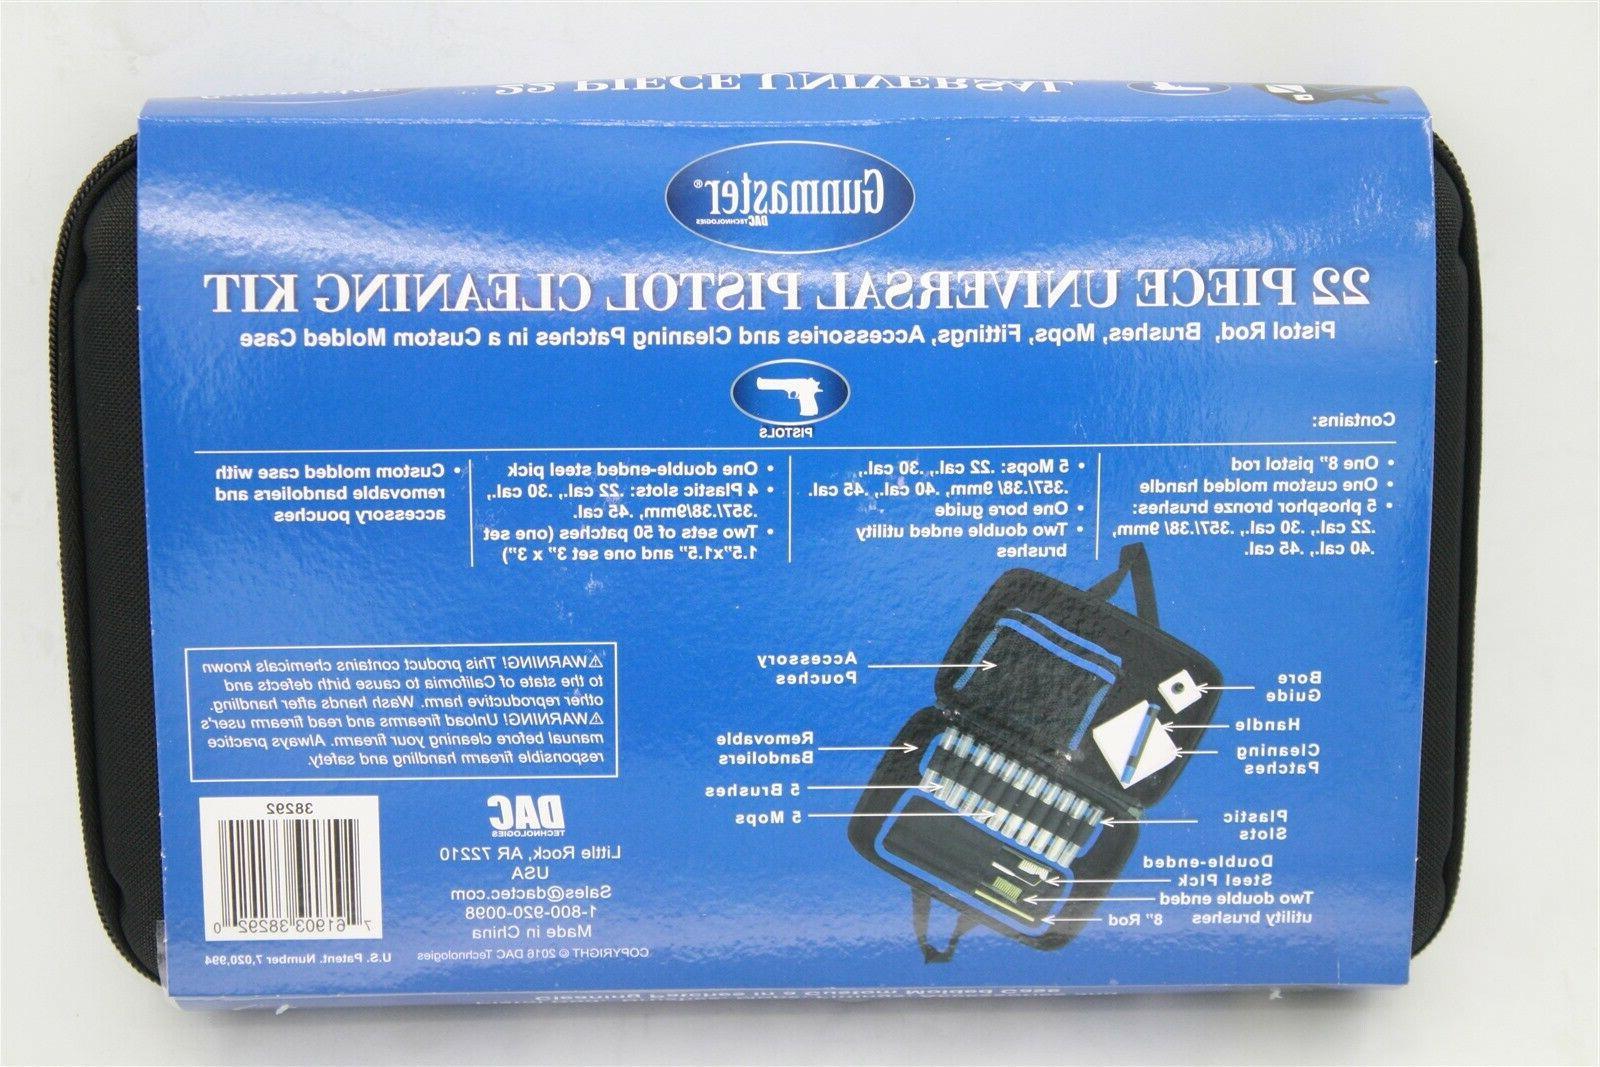 Gunmaster Pistol Universal 22 Soft Sided